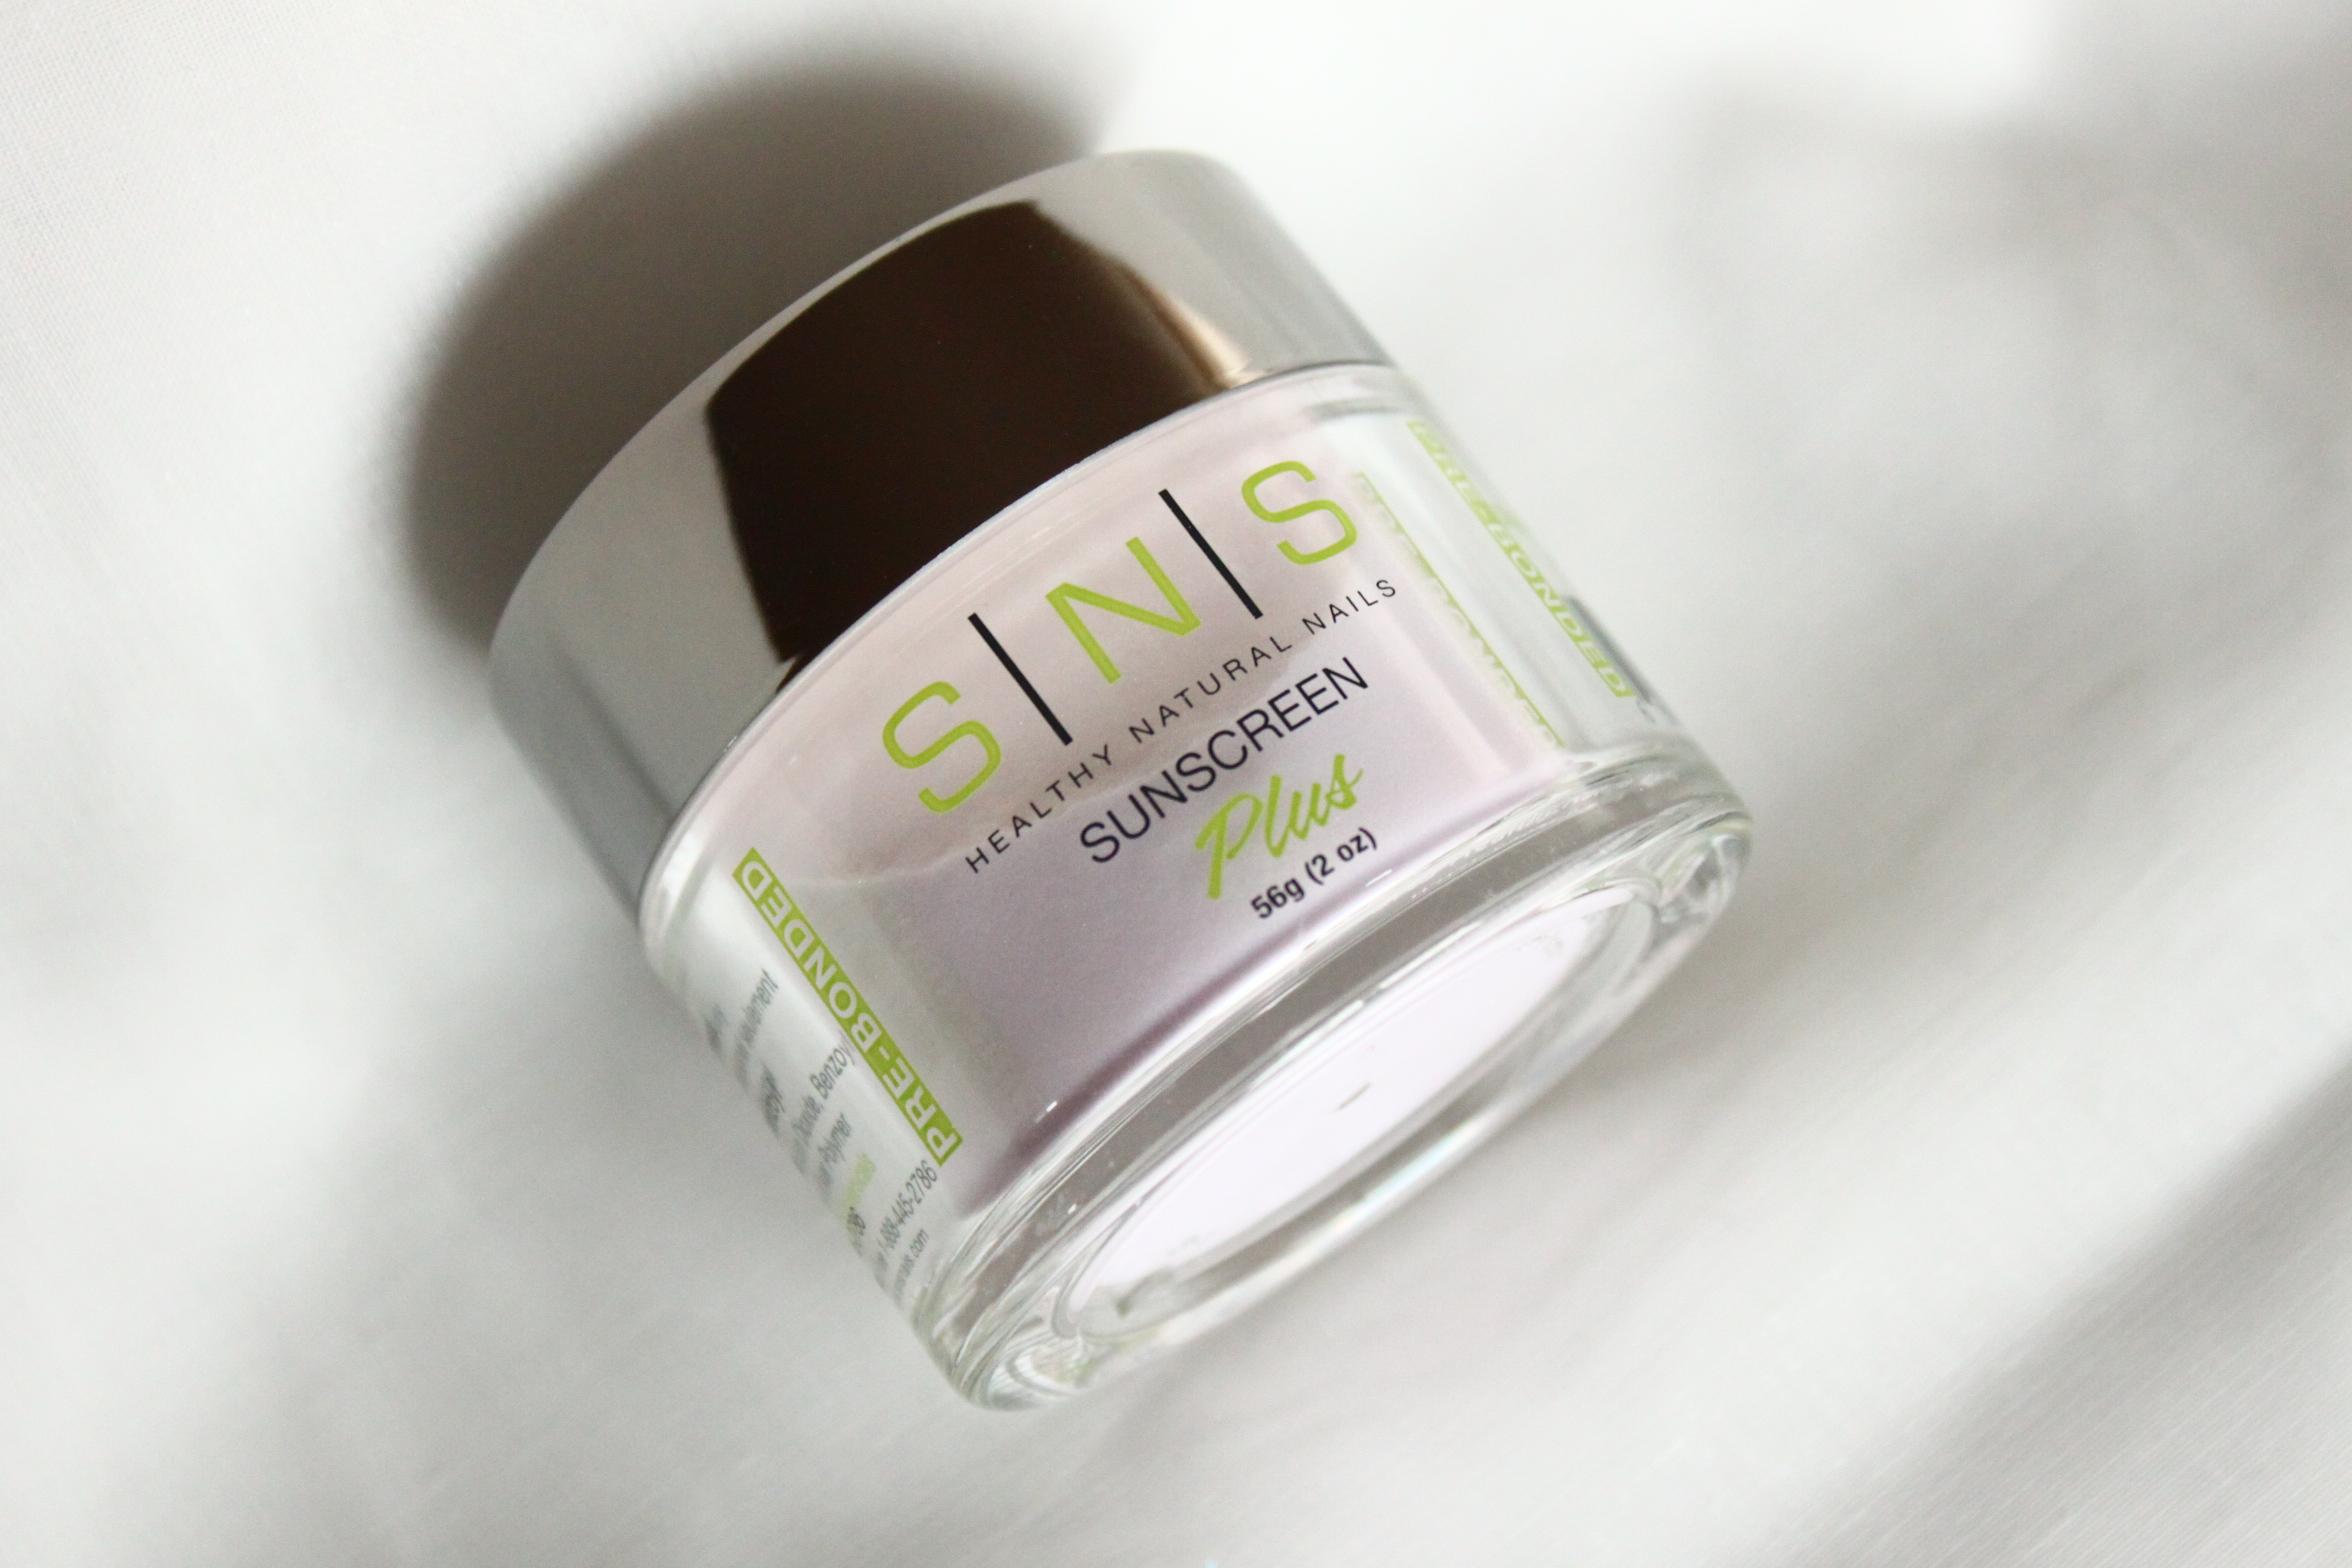 SNS Dip Powder Aufbaupulver Sunscreen  56g (2oz)